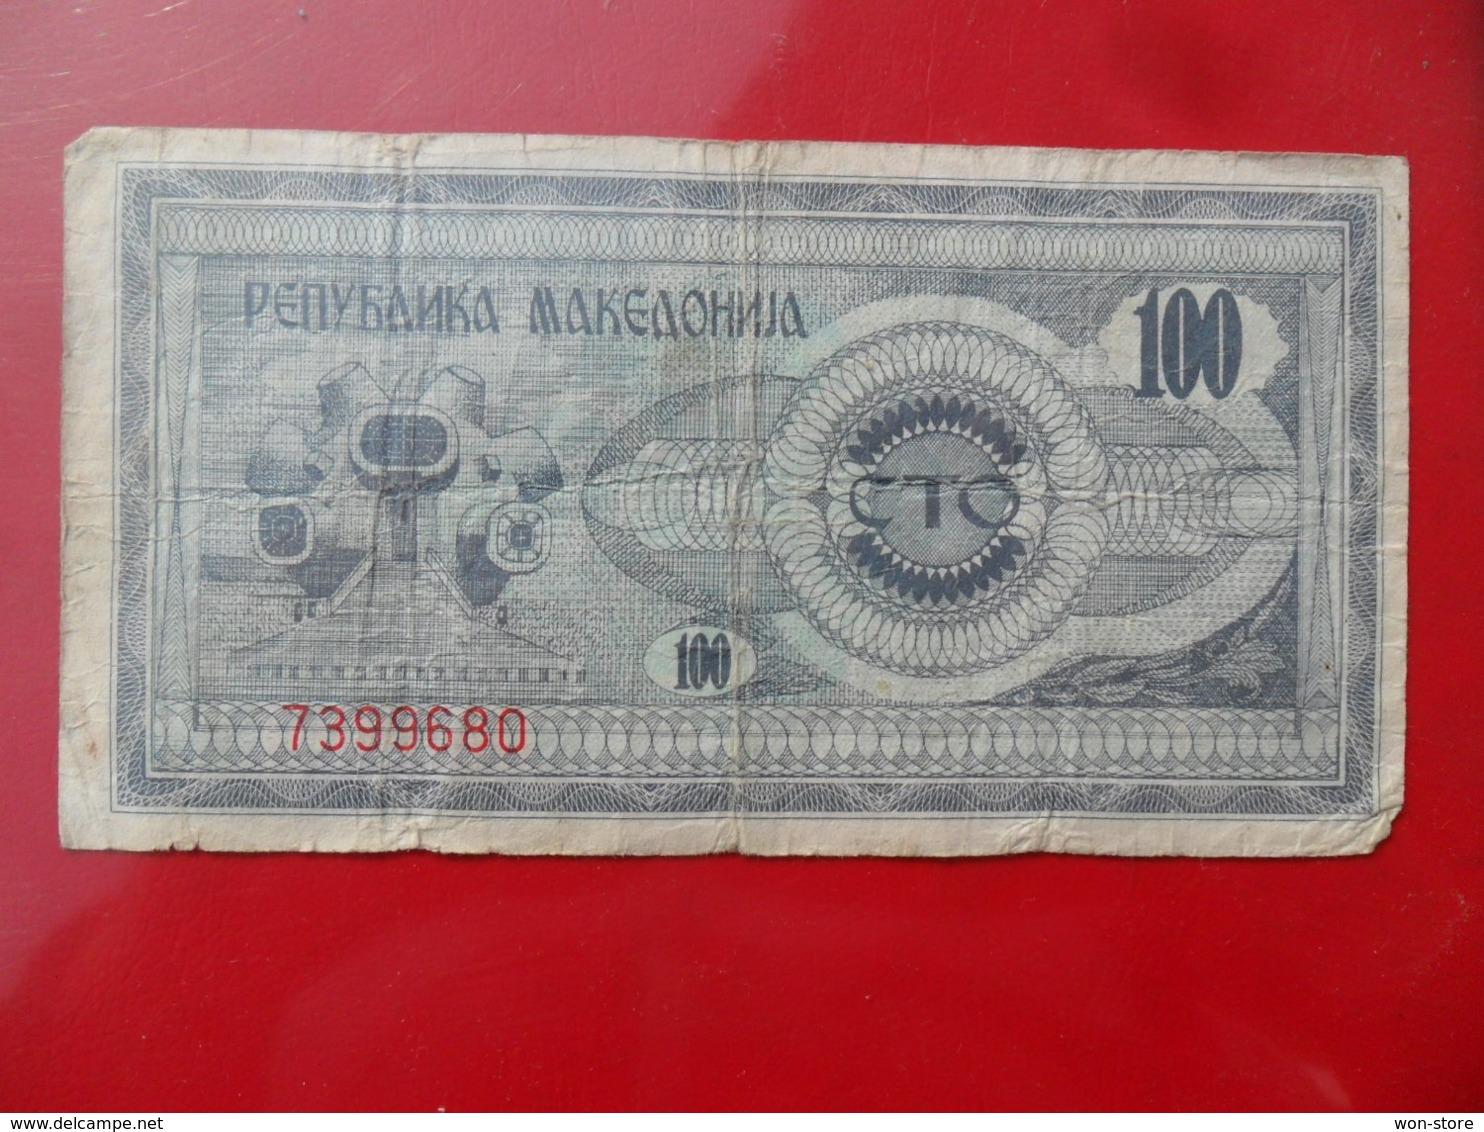 North Macedonia-Severna Makedonija 100 Denari 1993, P-4a - Macedonia